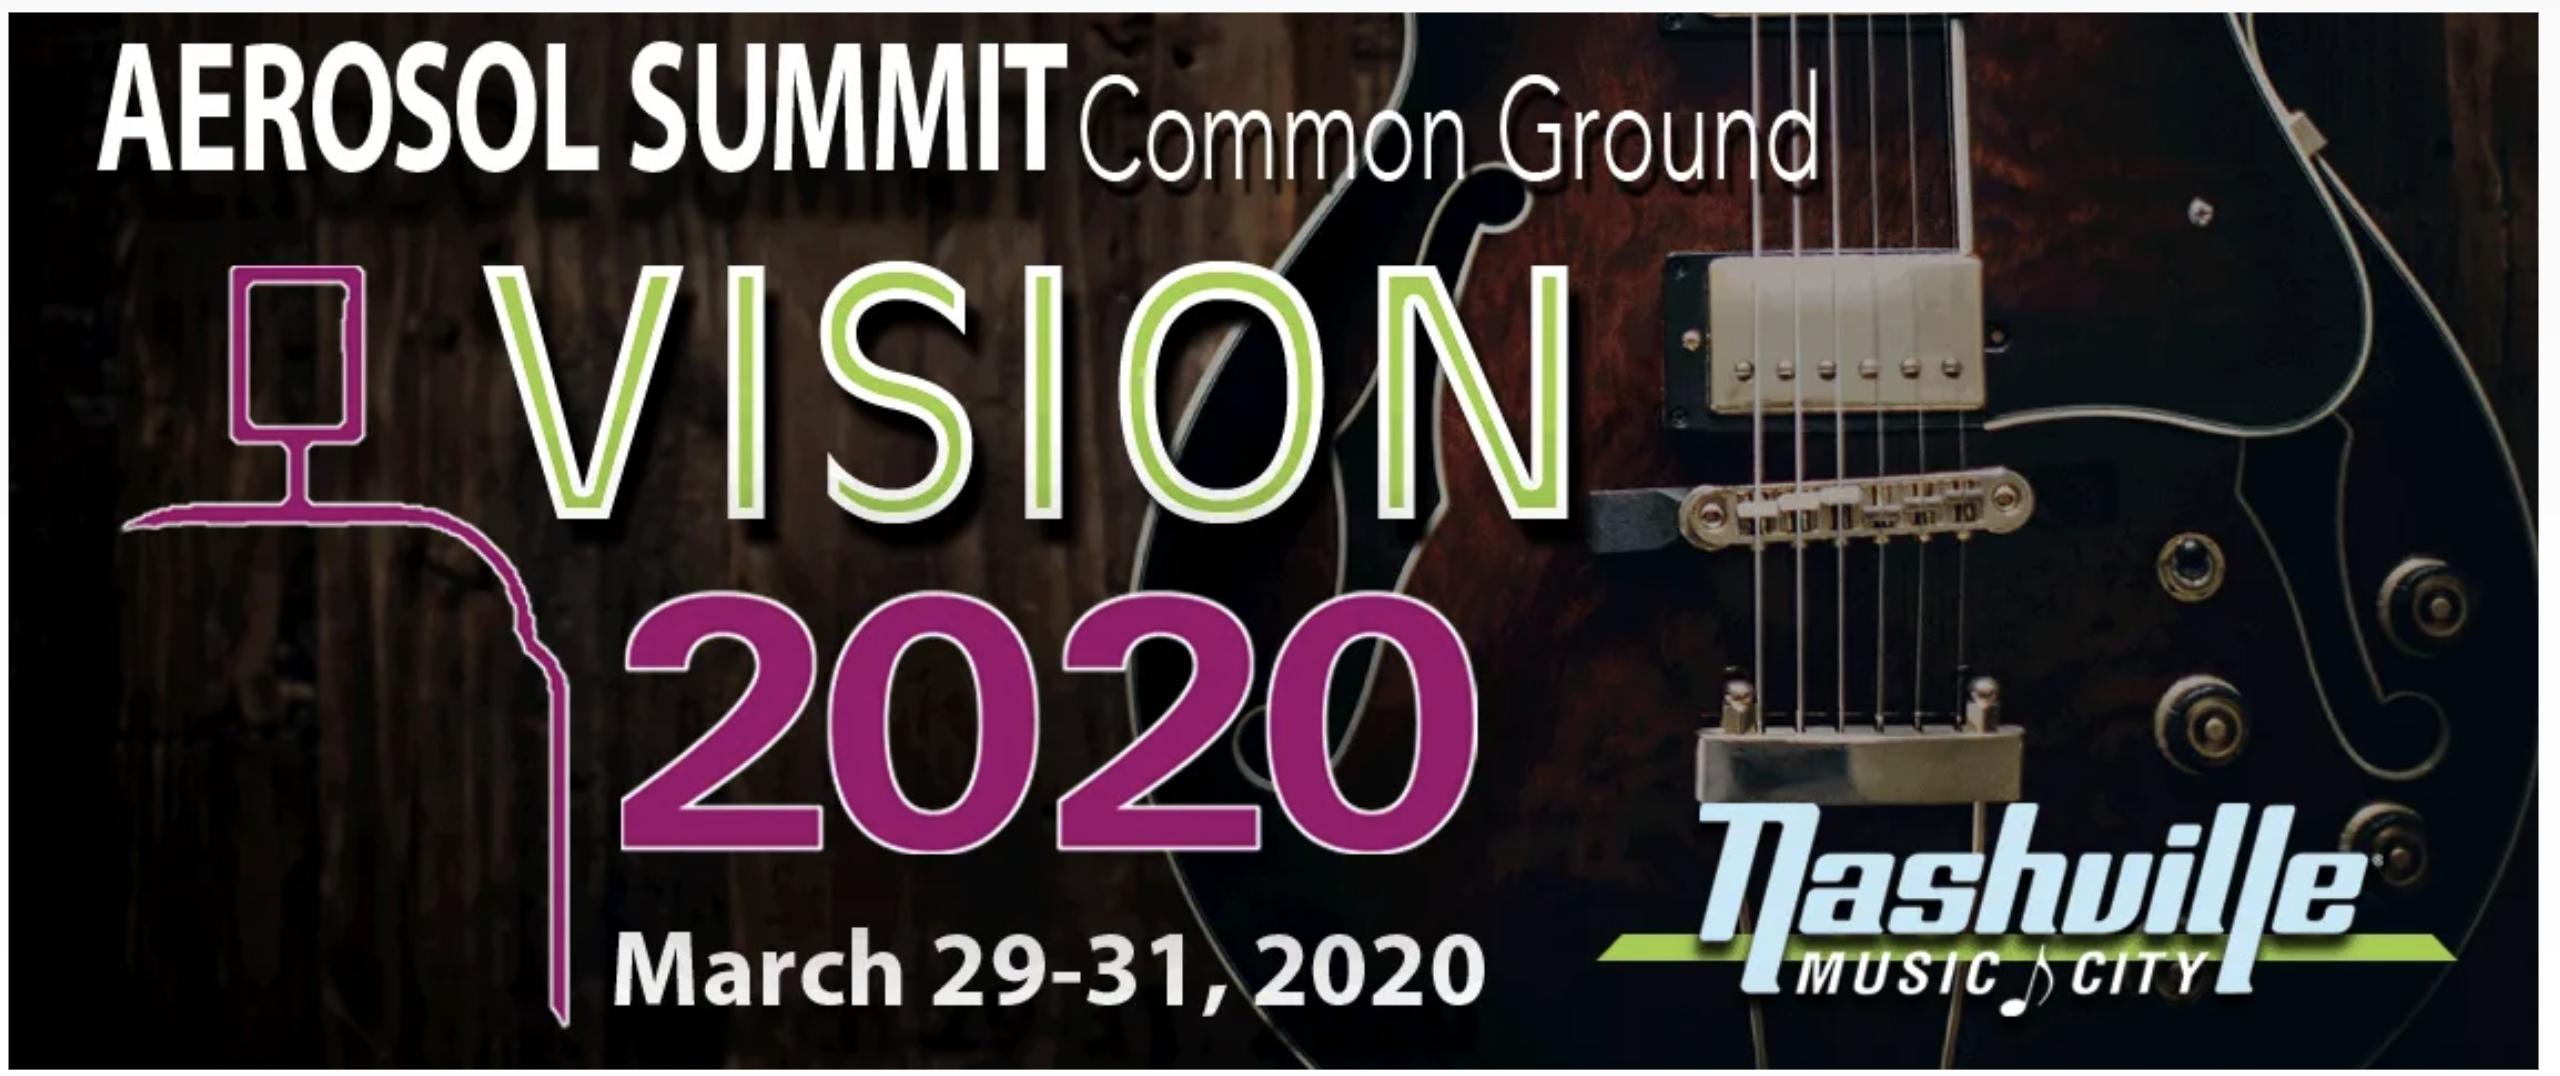 Aerosol Summit 2020 - Common Ground: The Future is Now